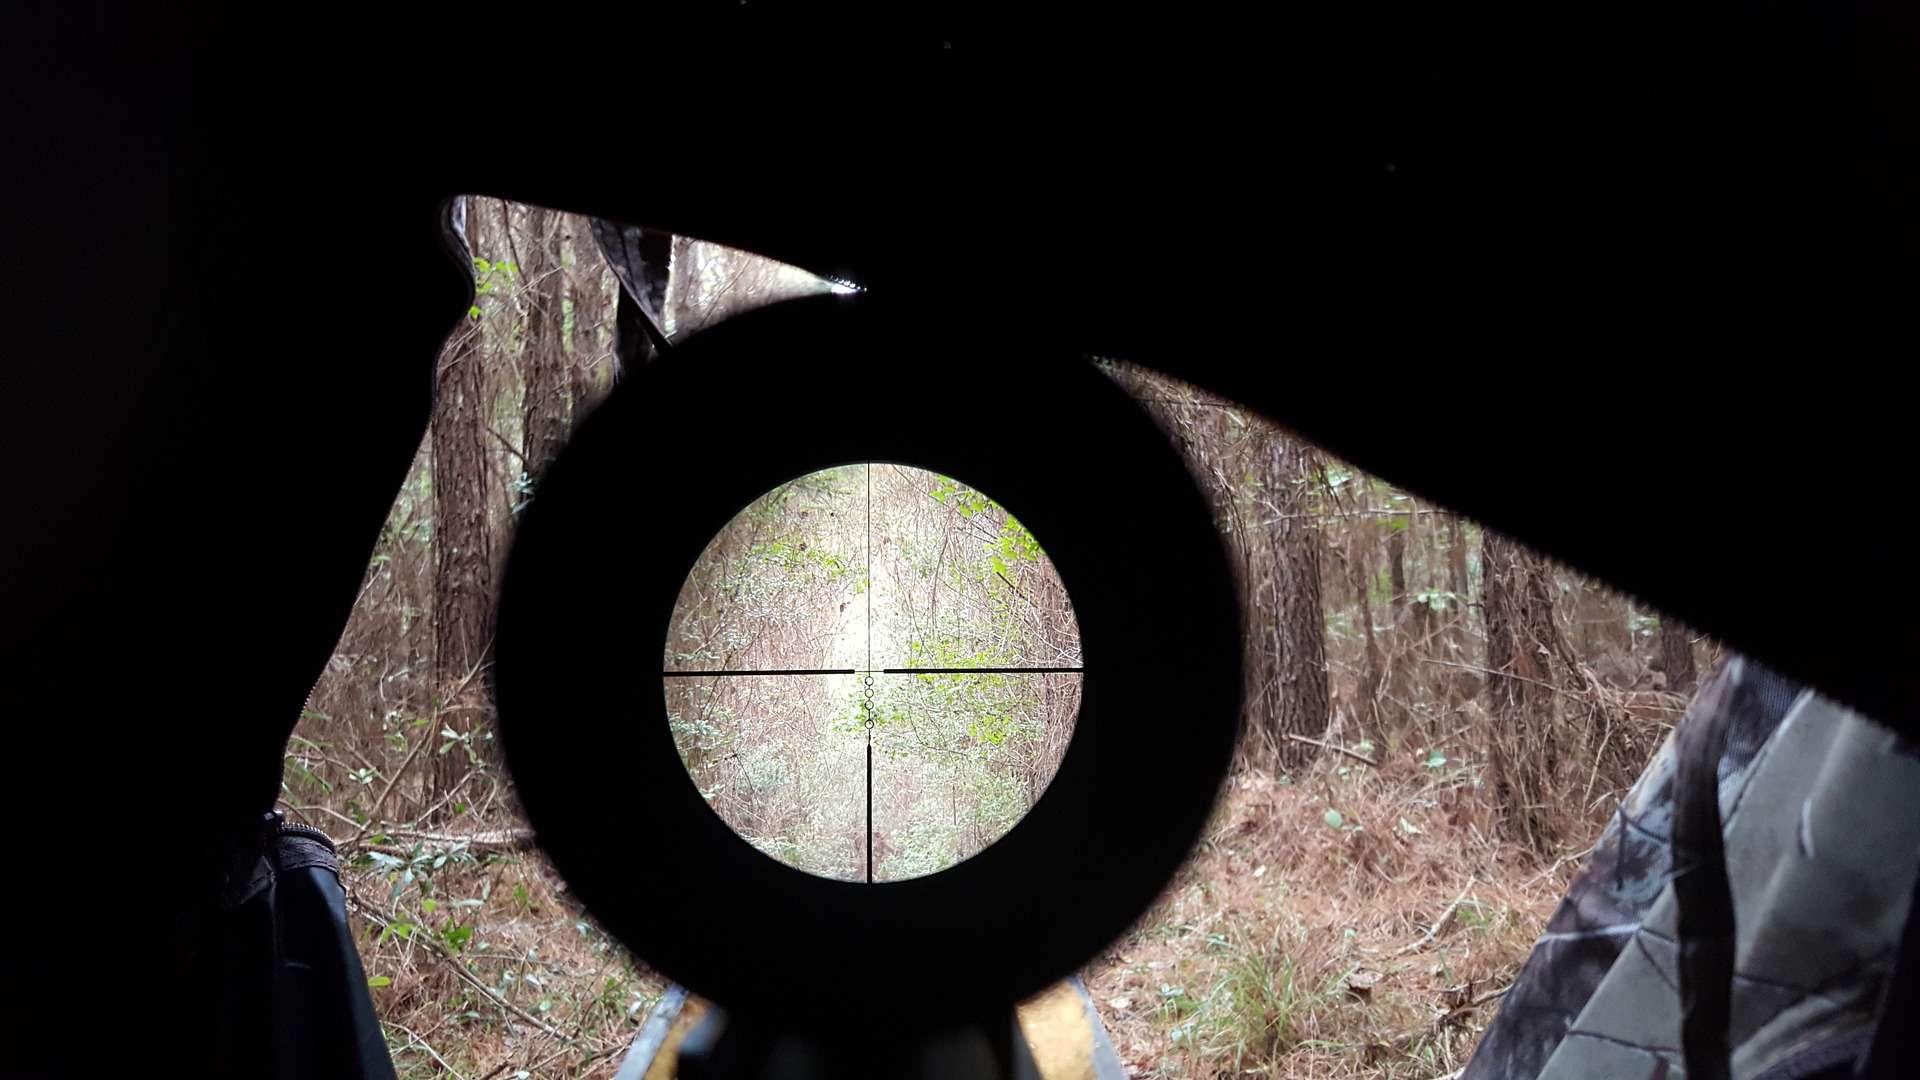 View through Scope at Target